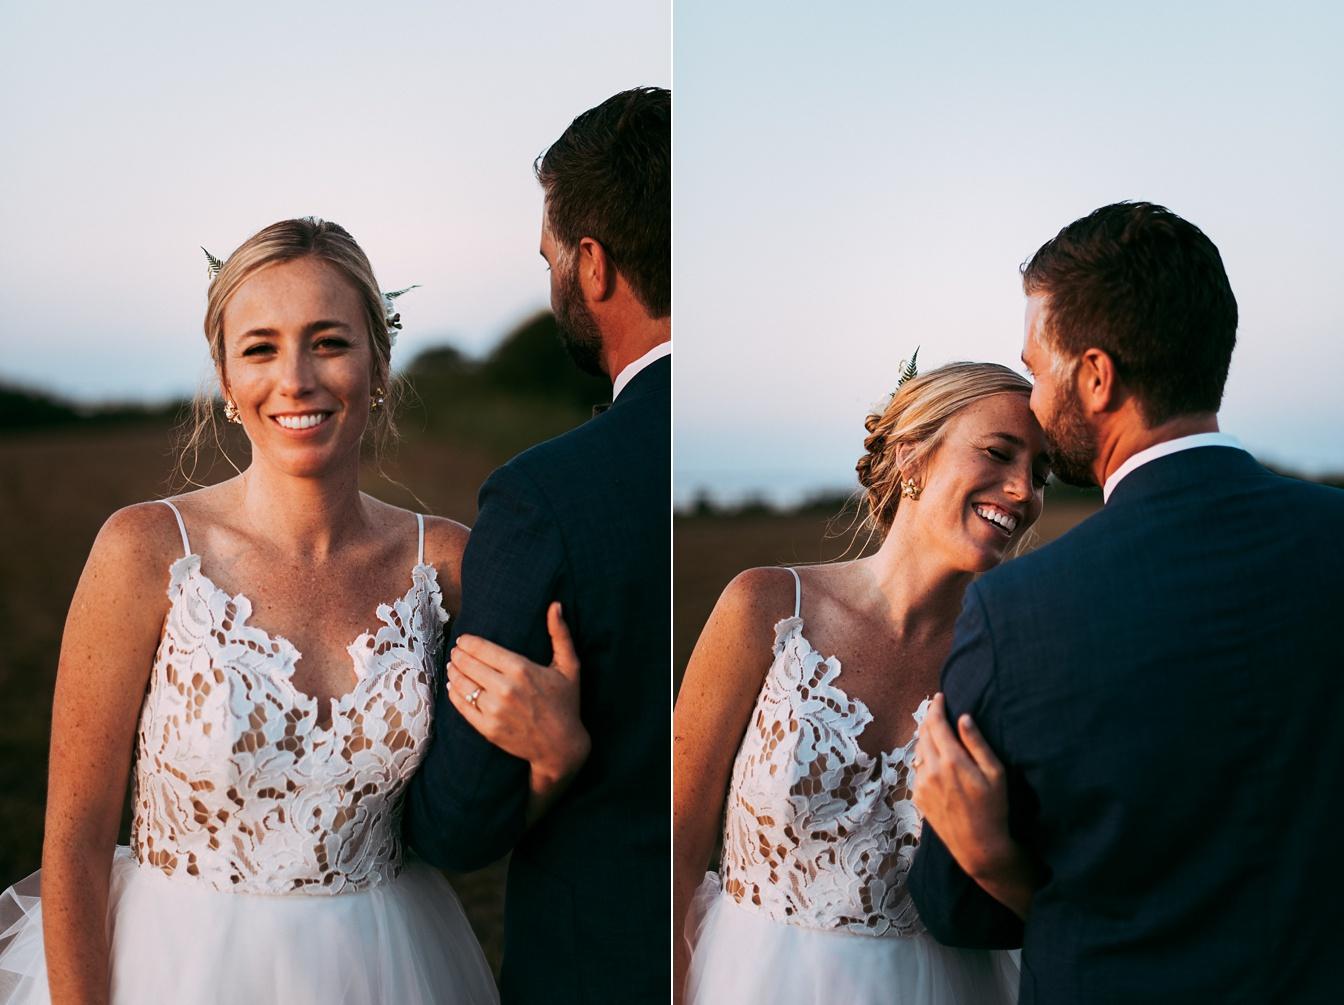 Eliza_Ben_Wedding_The_Foxes_Photography_541.jpg